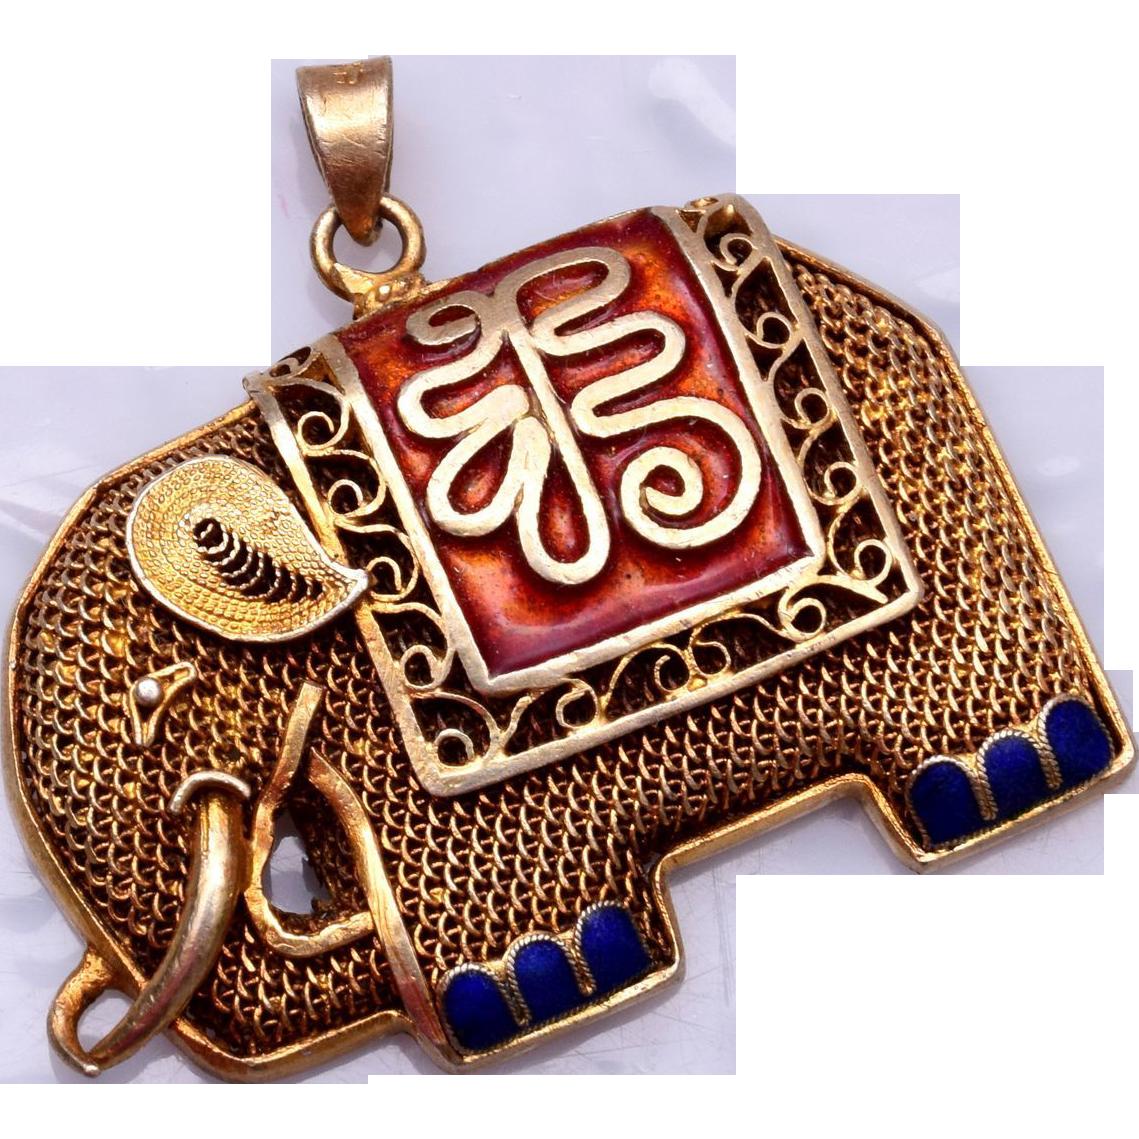 Chinese Filigree and Silver Enameled Elephant Pendant